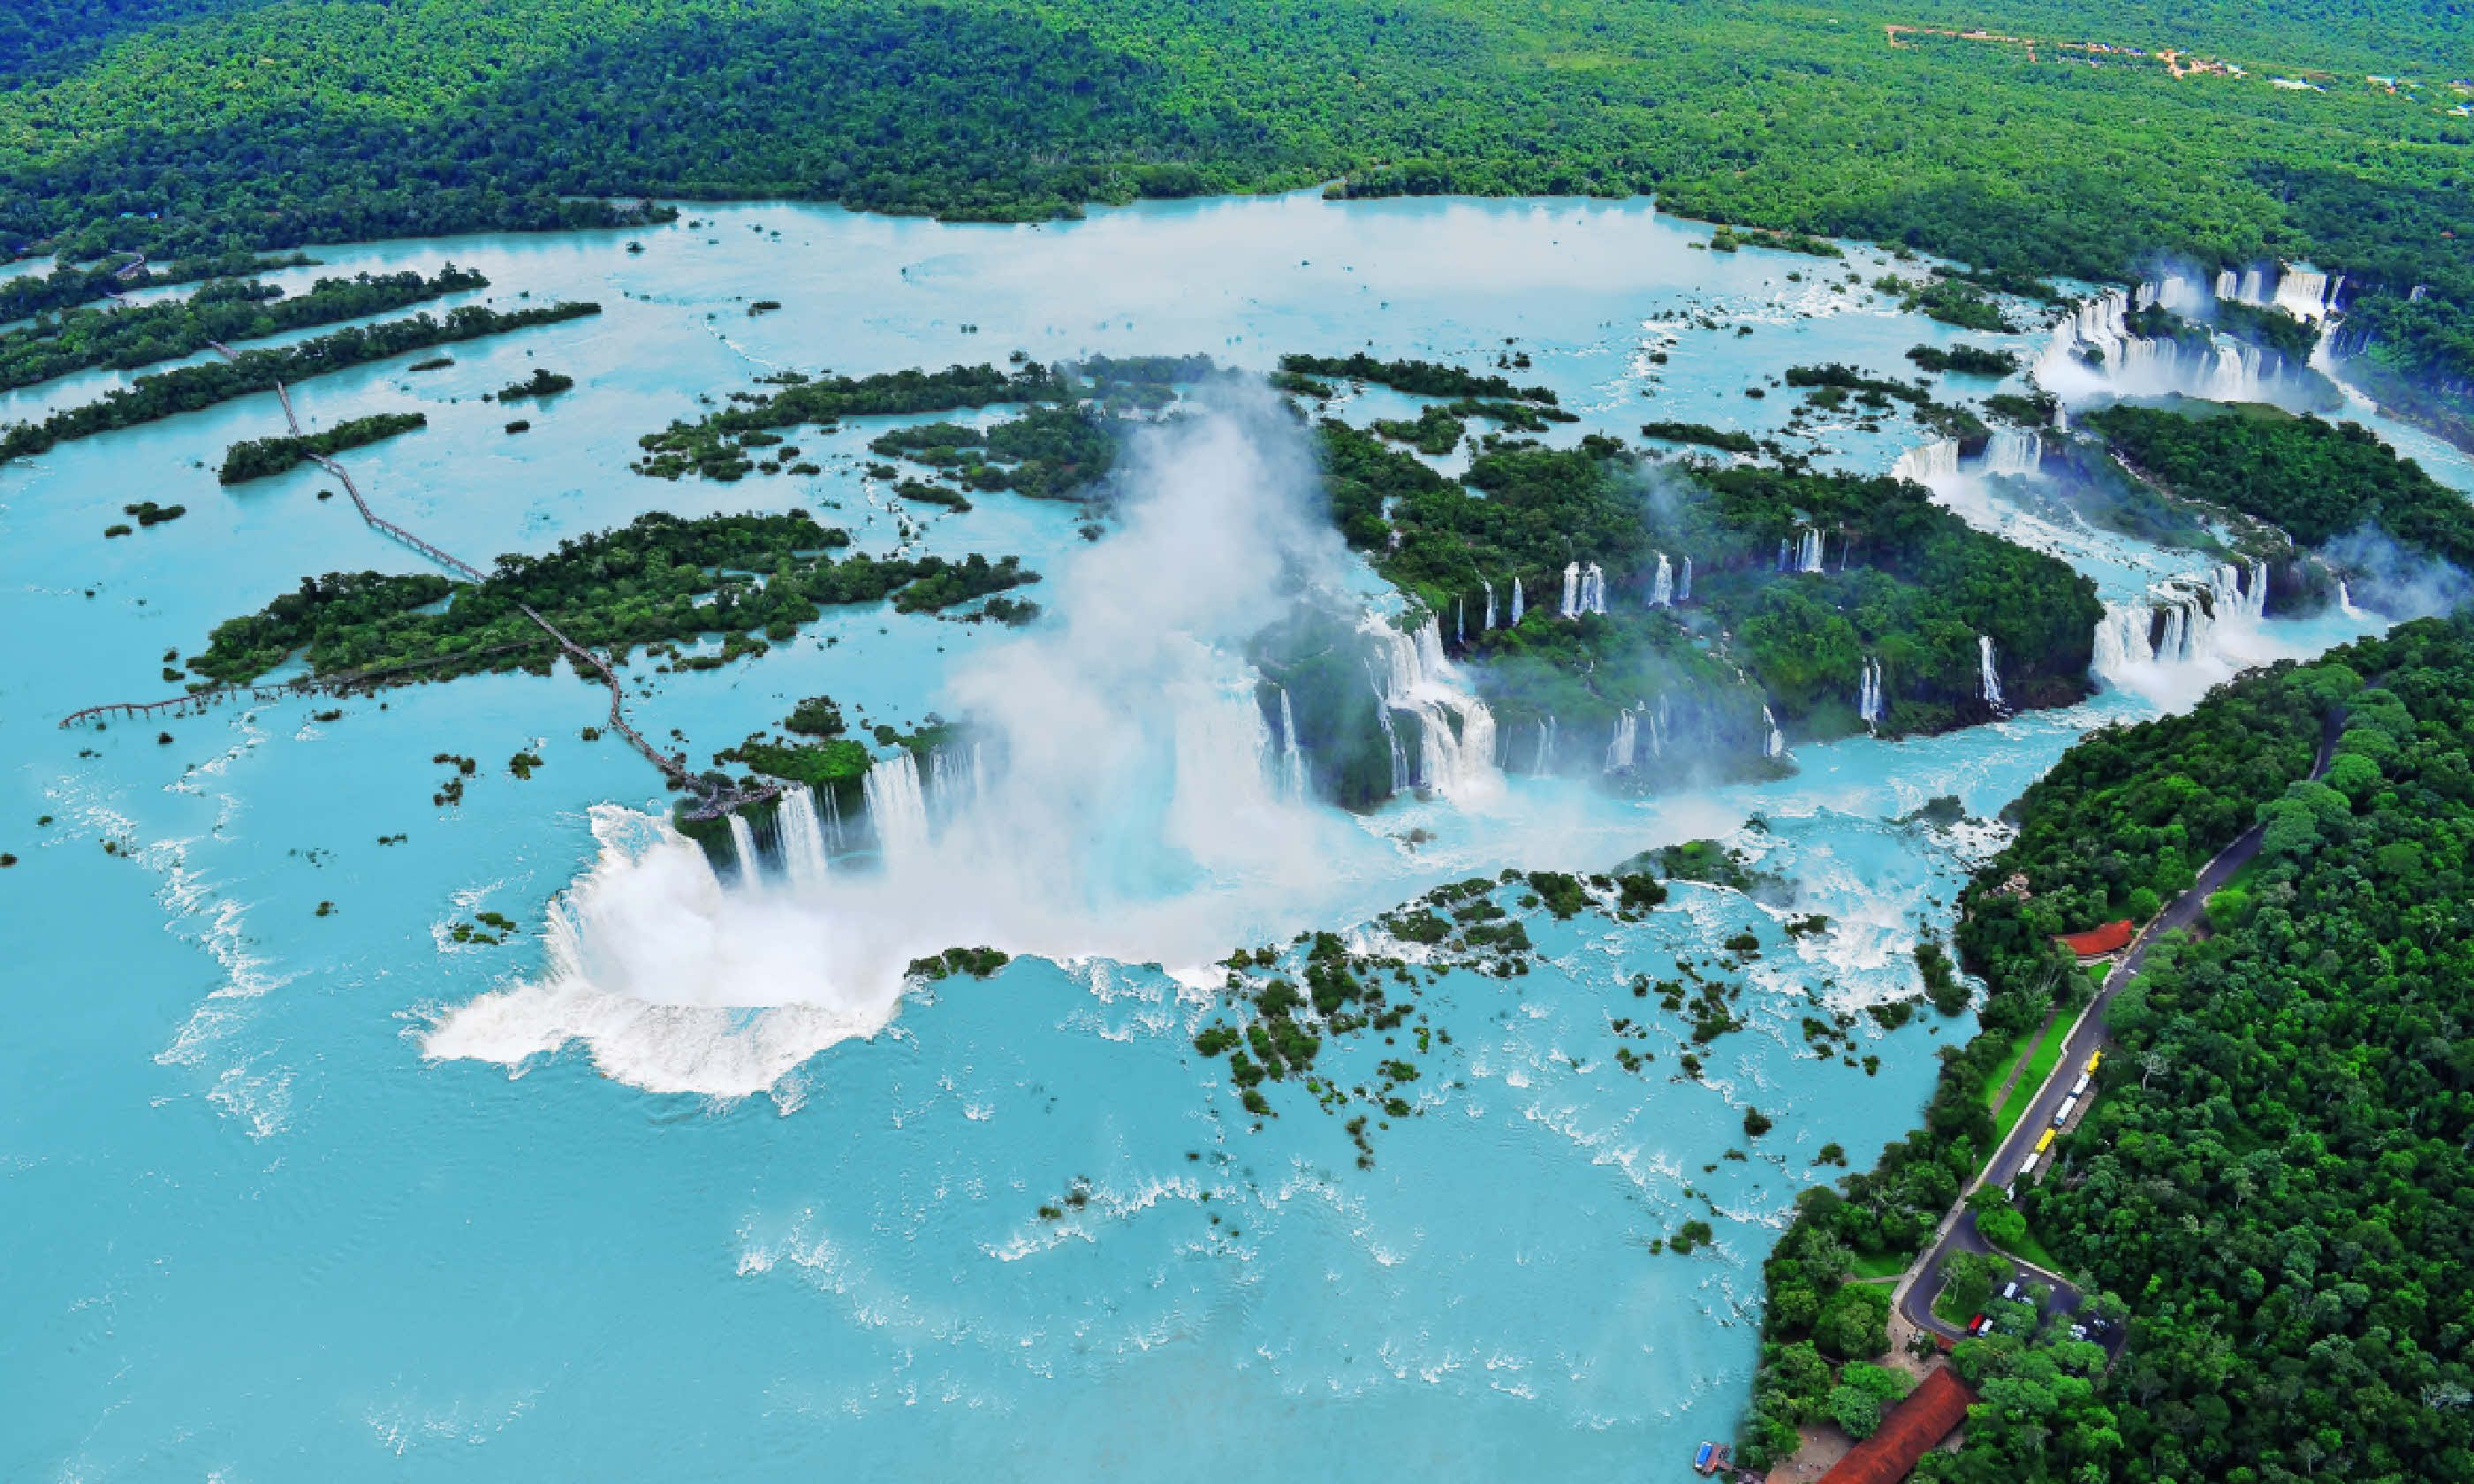 Iguazú waterfalls from helicopter (Shutterstock)